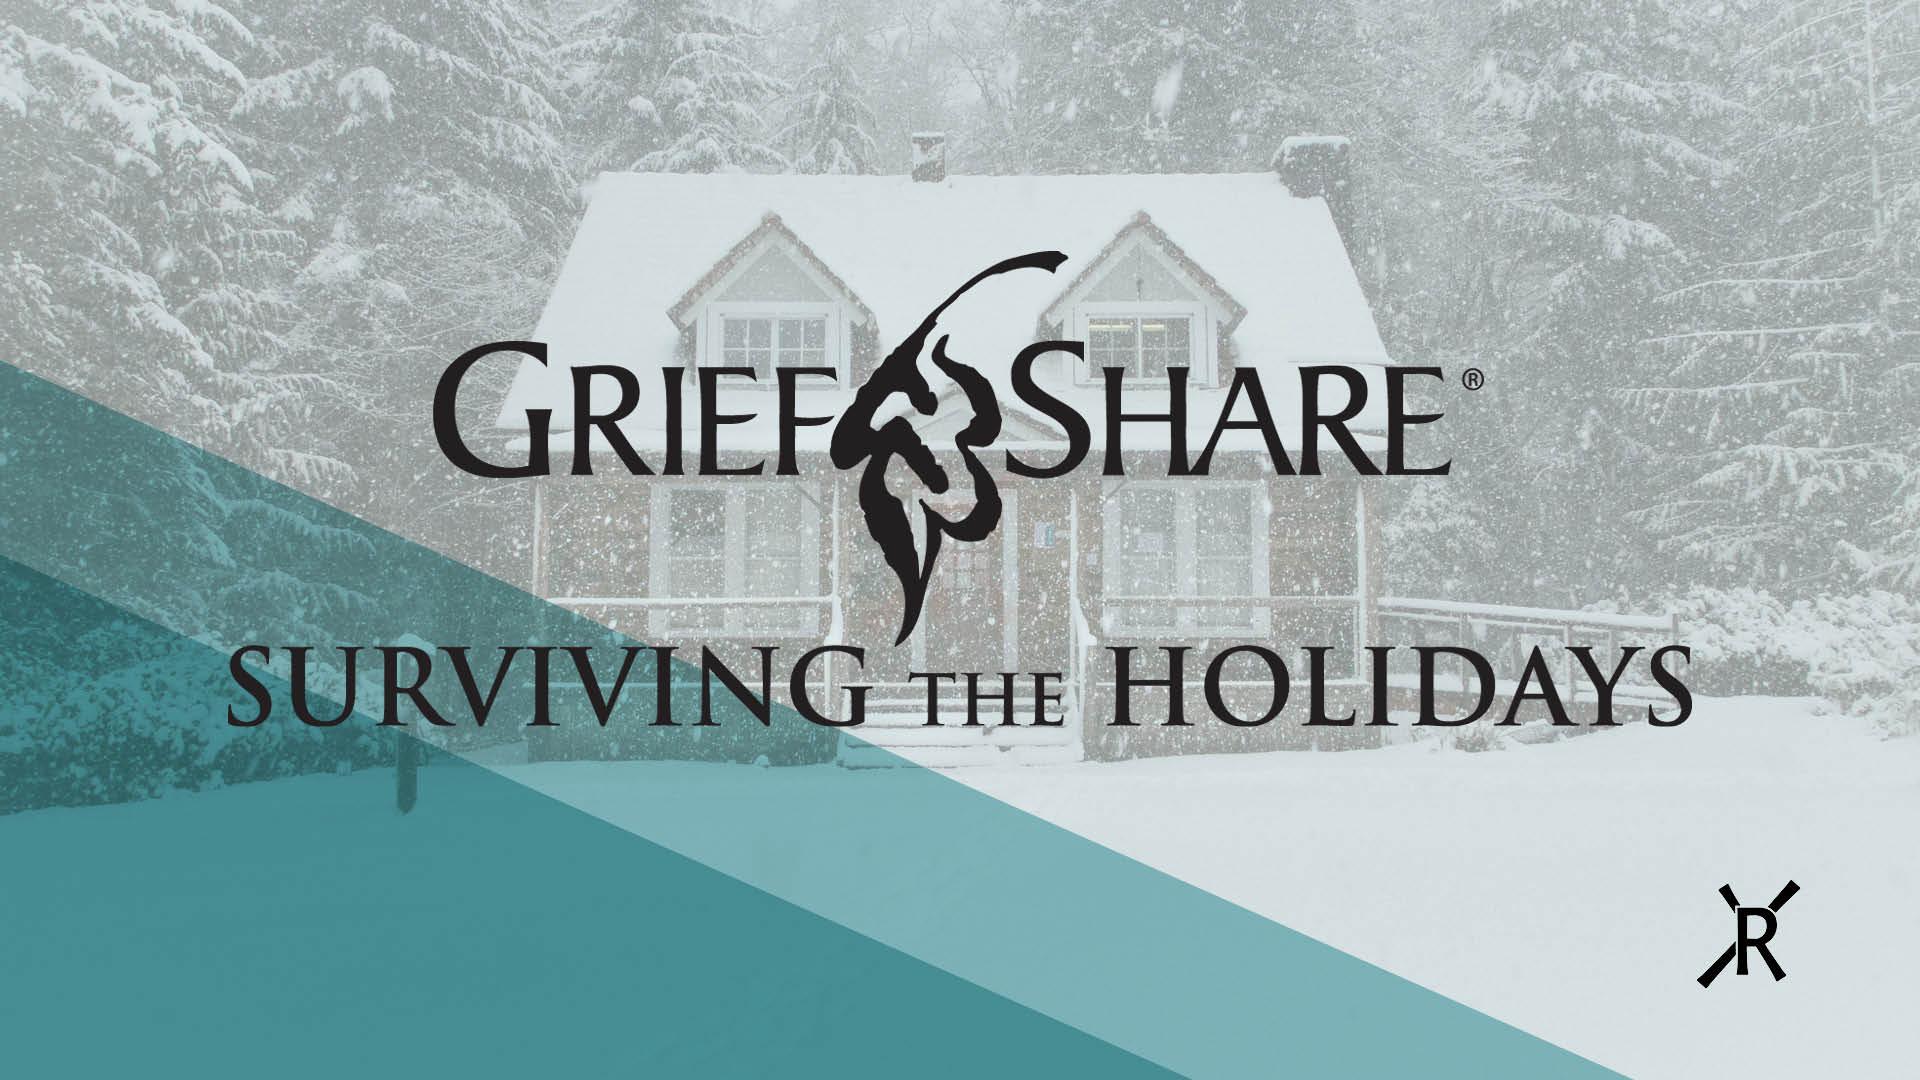 CR_website_Surviving the Holidays.jpg